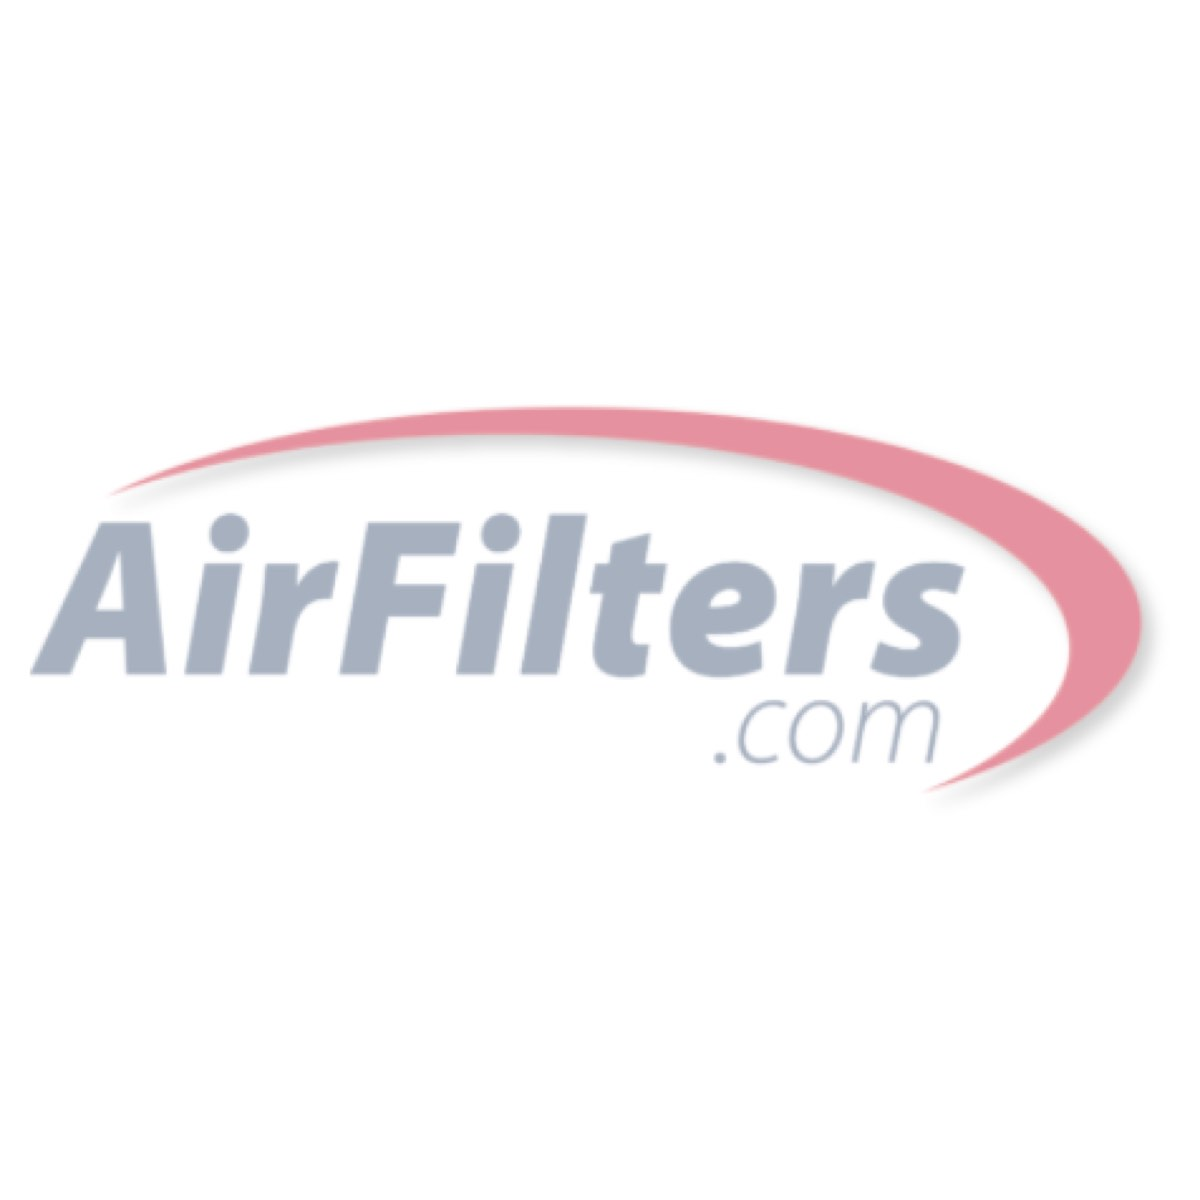 York 20x20x5 (20.75x20.25x5.25) Air Filters